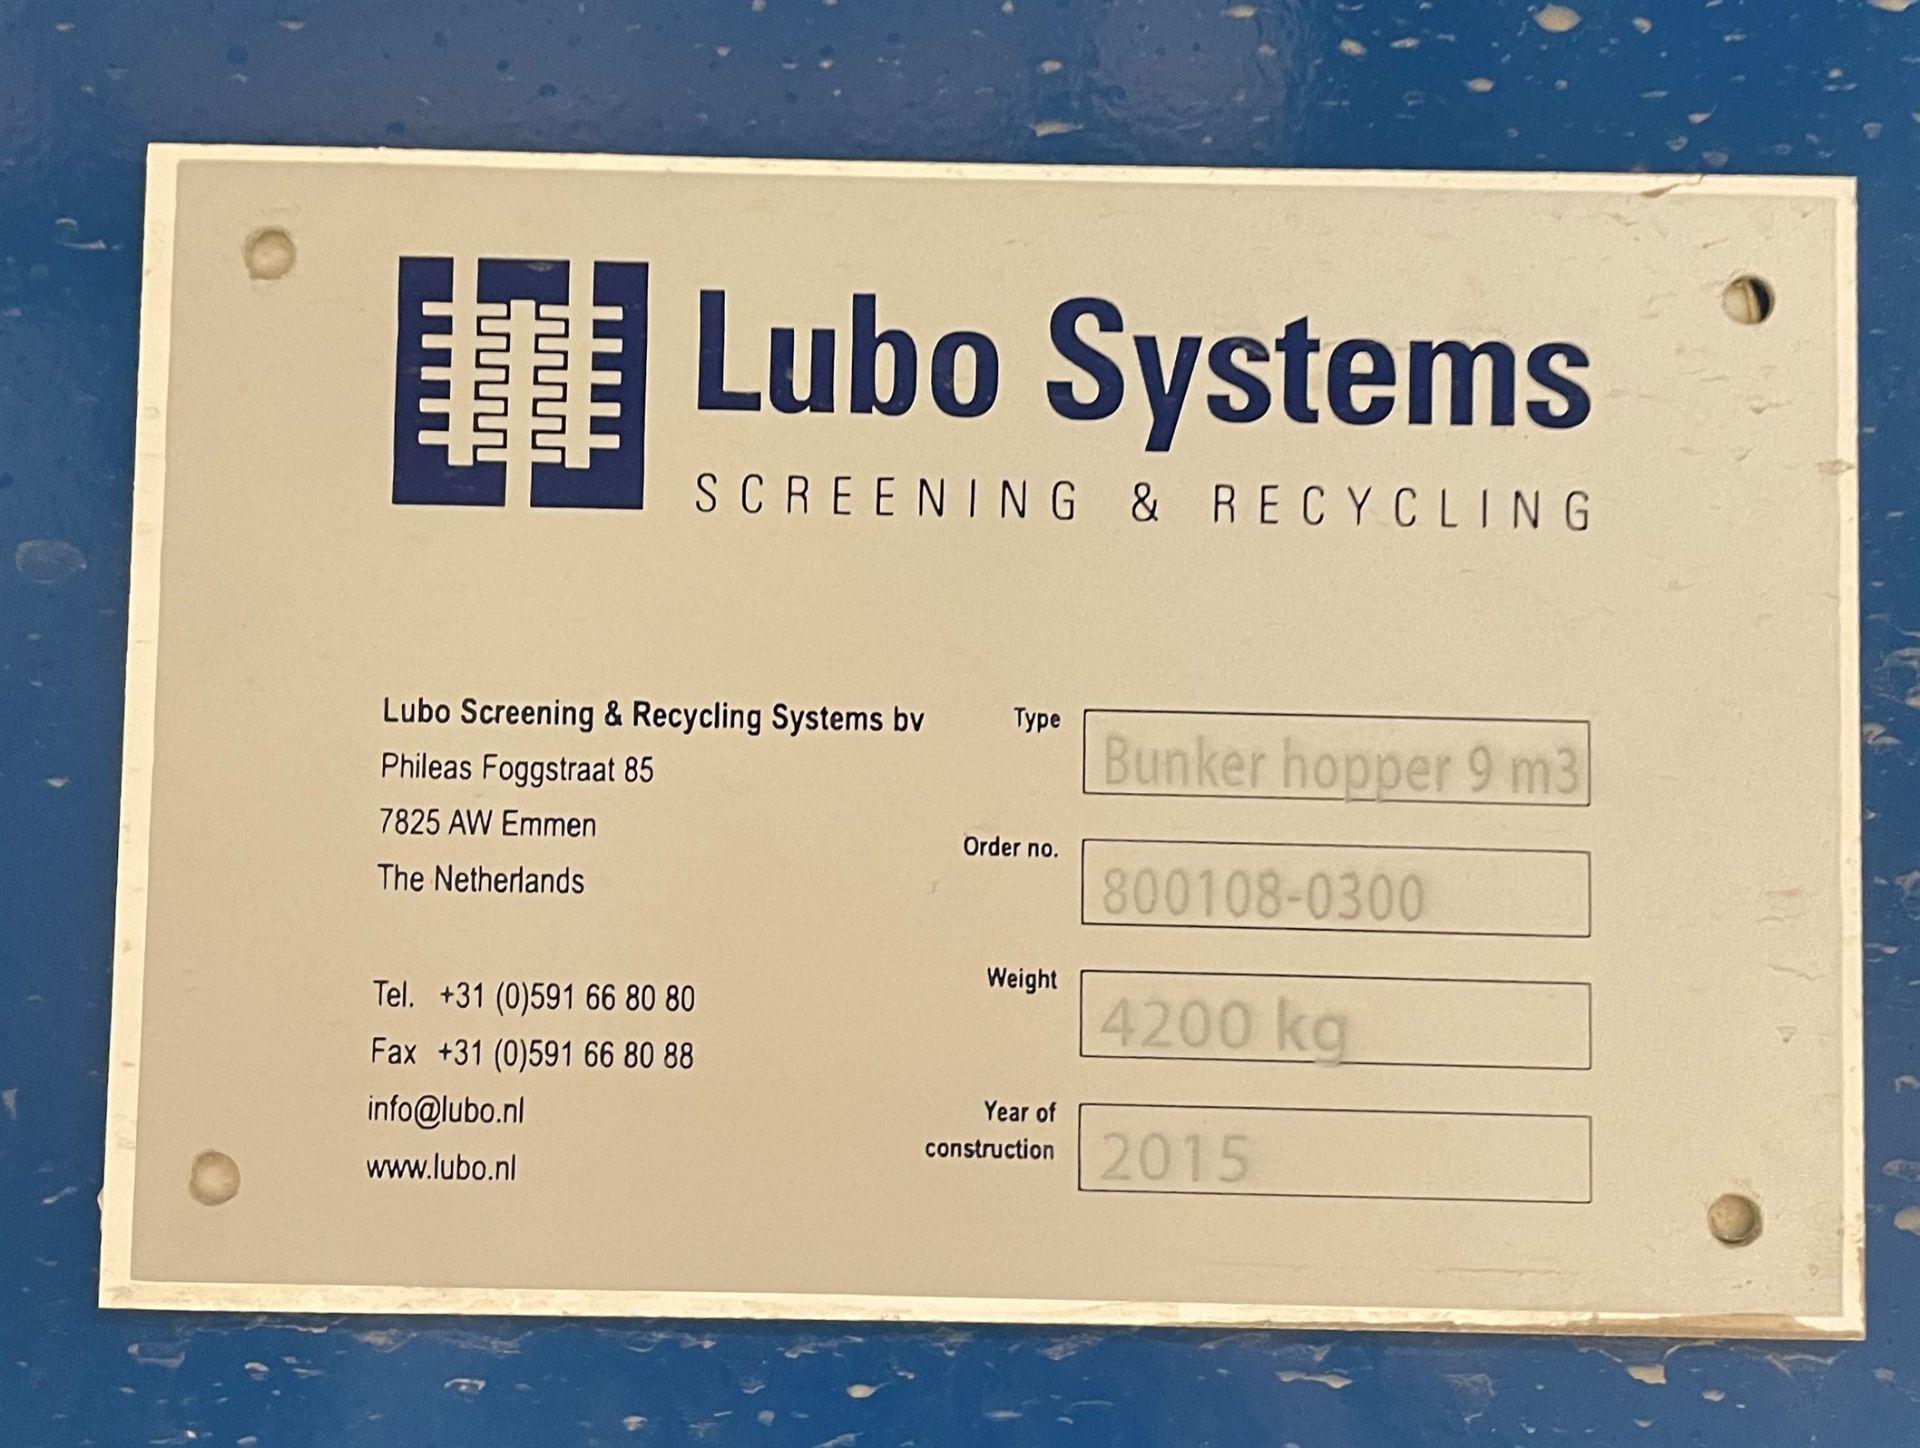 2015 SCREENING MACHINES HLOGO-60/300-25 Shaker Screen, s/n 1512A2186, 600 x 3000 x 250mm Trough, (2) - Image 12 of 12